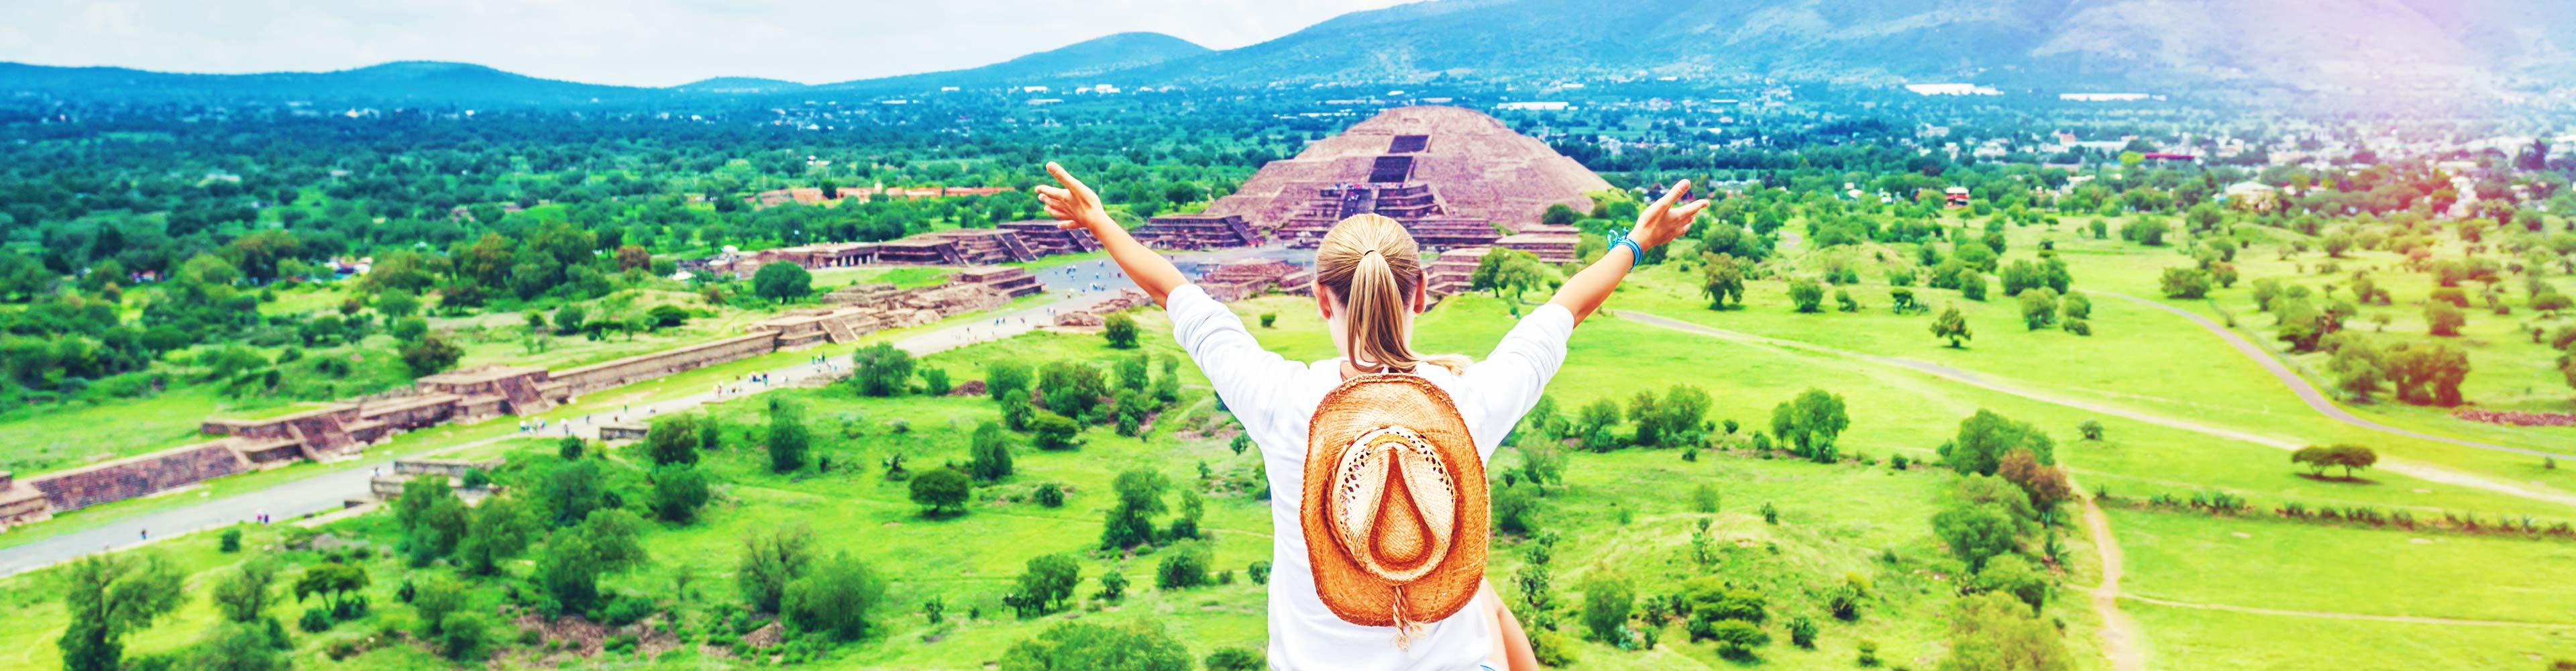 Epic Central America